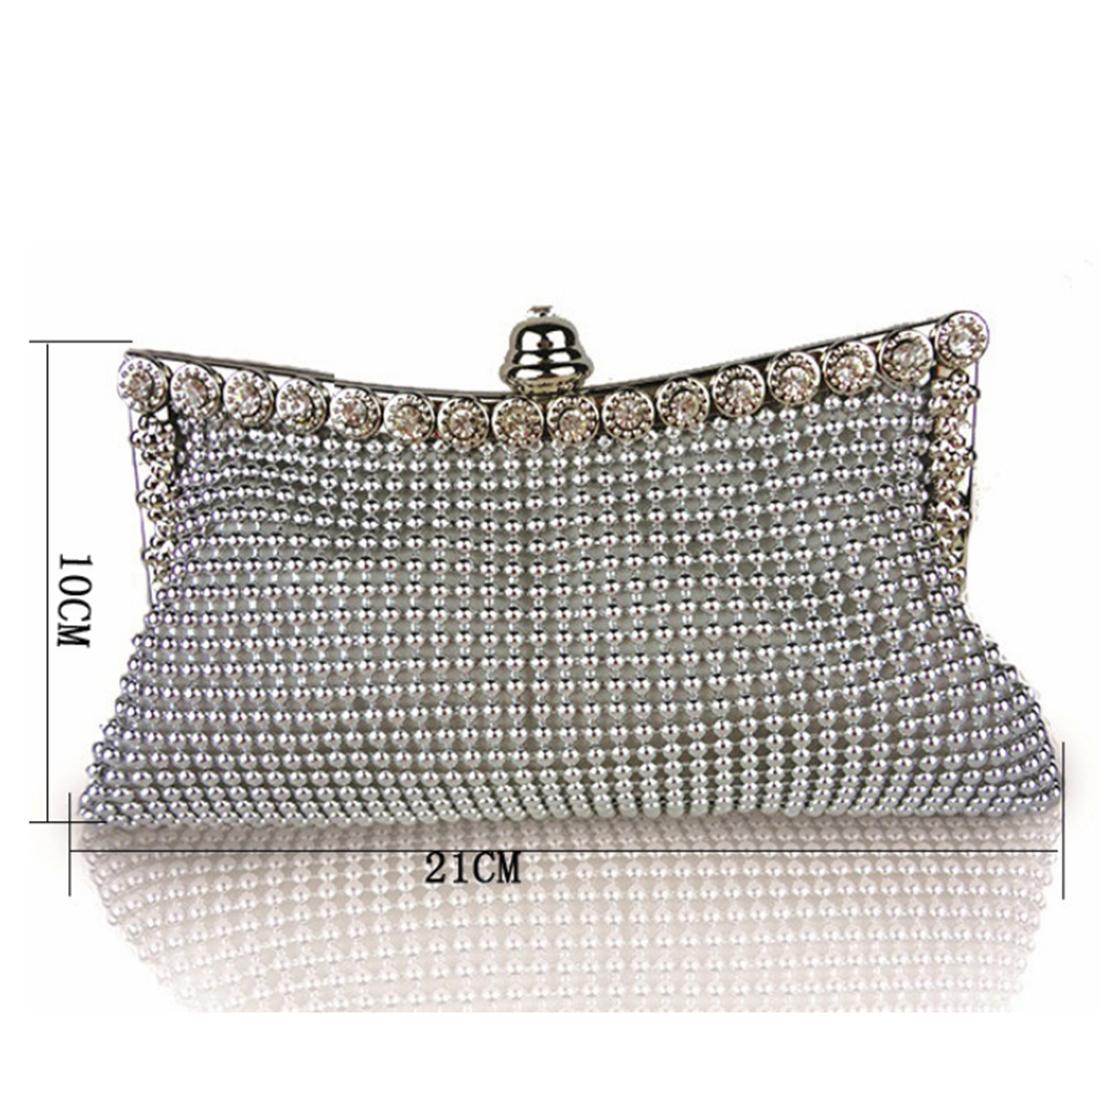 Luxury Women Handbag Gorgeous Aluminium Flake Banquet Bag Crystal Lady Handbag Dress Up For Party Formal Dress Evening Clutch D18110106